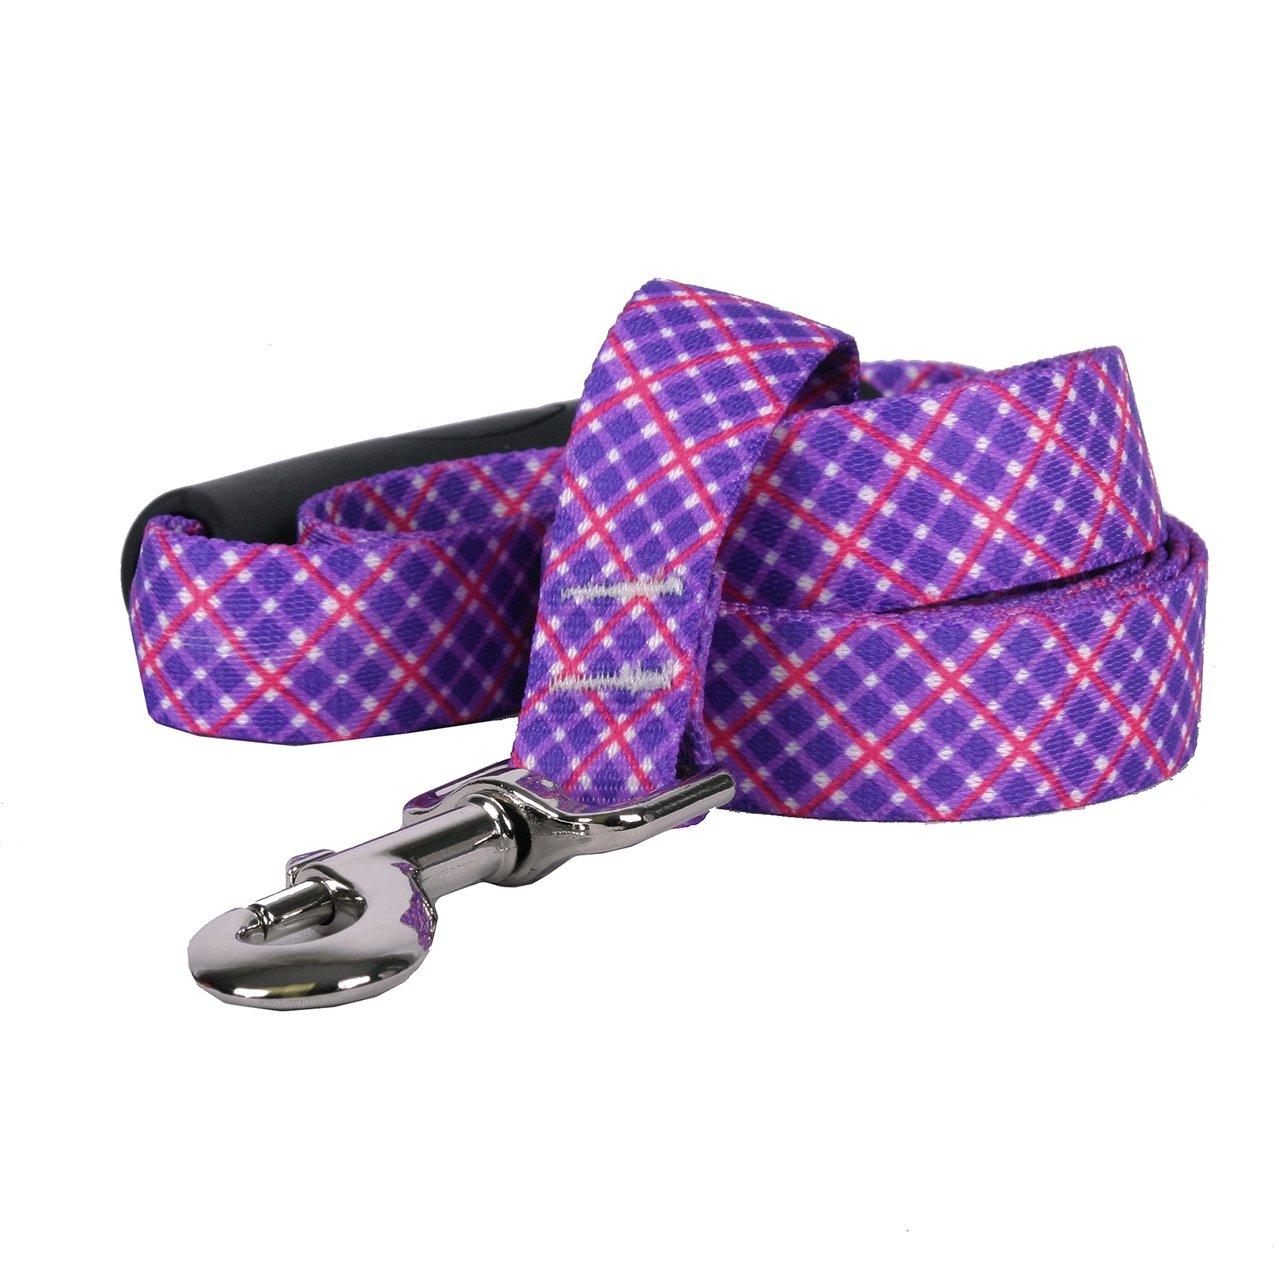 Yellow Dog Design Purple Pink Diagonal Plaid EZ-Grip Dog Leash, Large-1'' Wide 5' (60'') Long